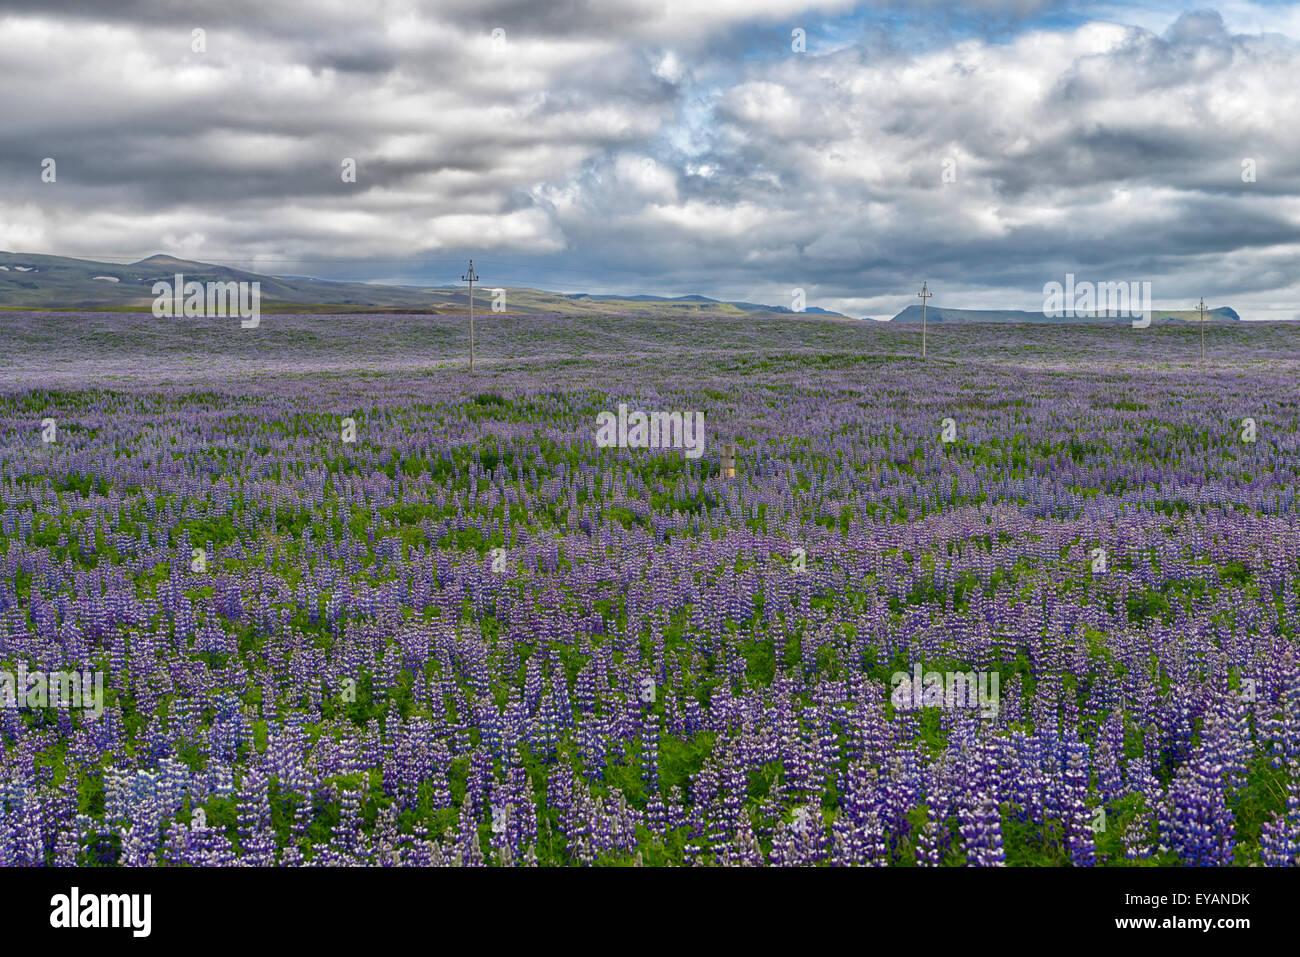 Nootka Lupine Flowers Field near Reykjavik, Iceland - Stock Image